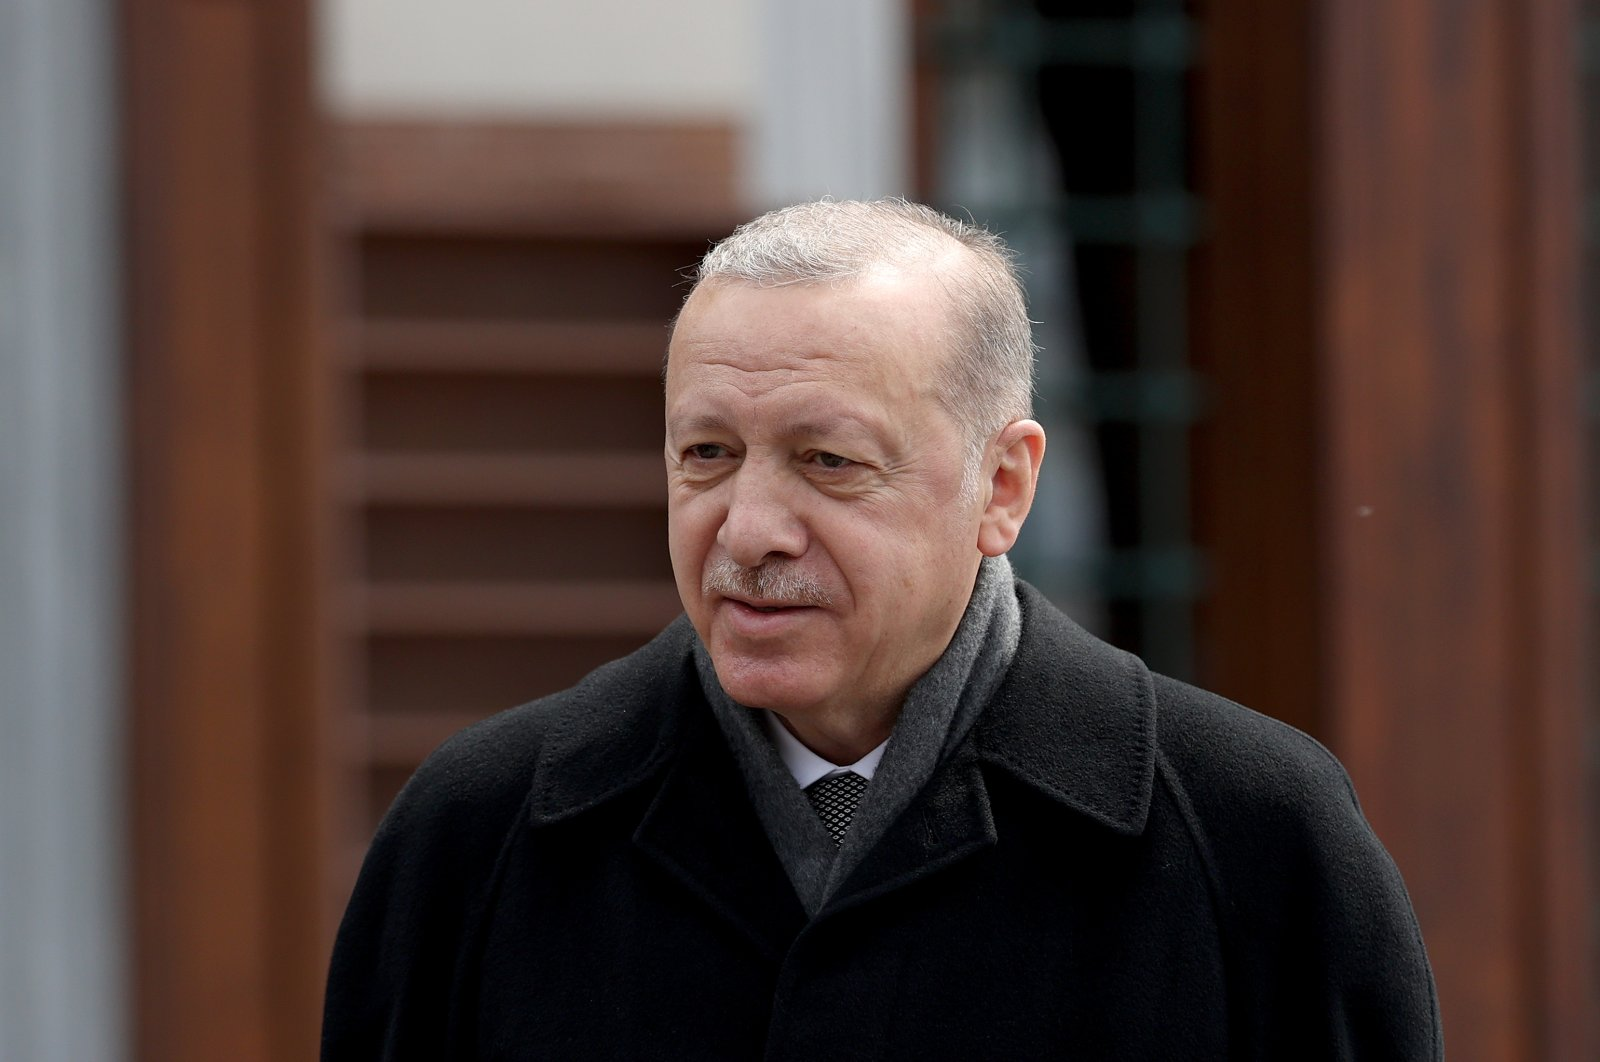 President Recep Tayyip Erdoğan speaks with reporters following Friday prayers in Istanbul, Turkey, April 16, 2021. (AA)